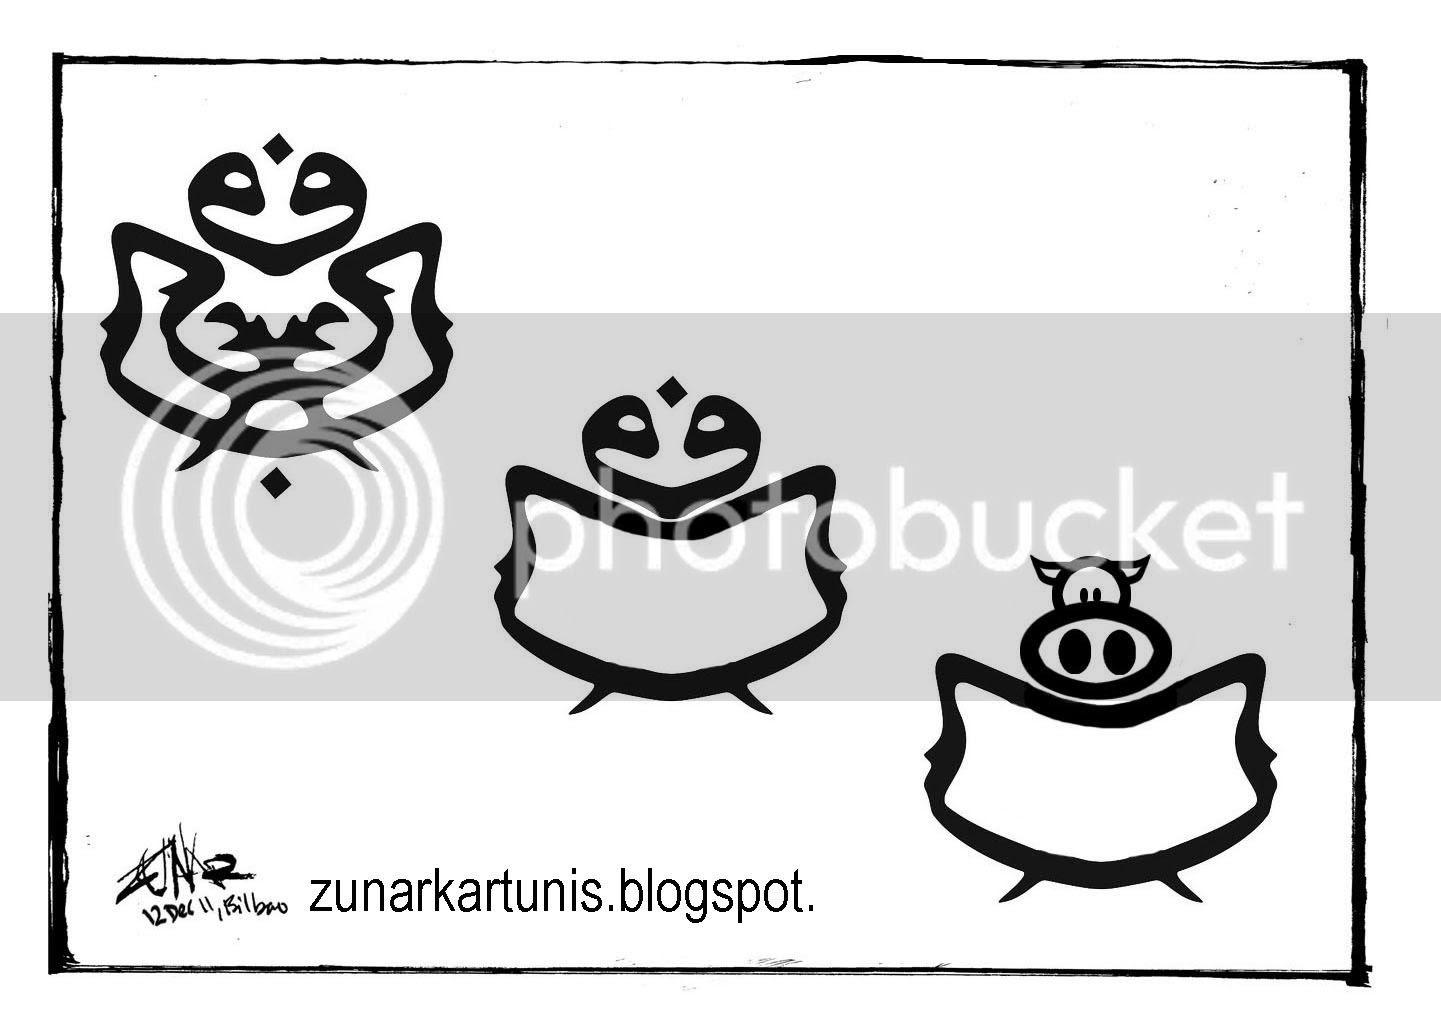 Zunar's brilliant cartoon, image hosting by Photobucket